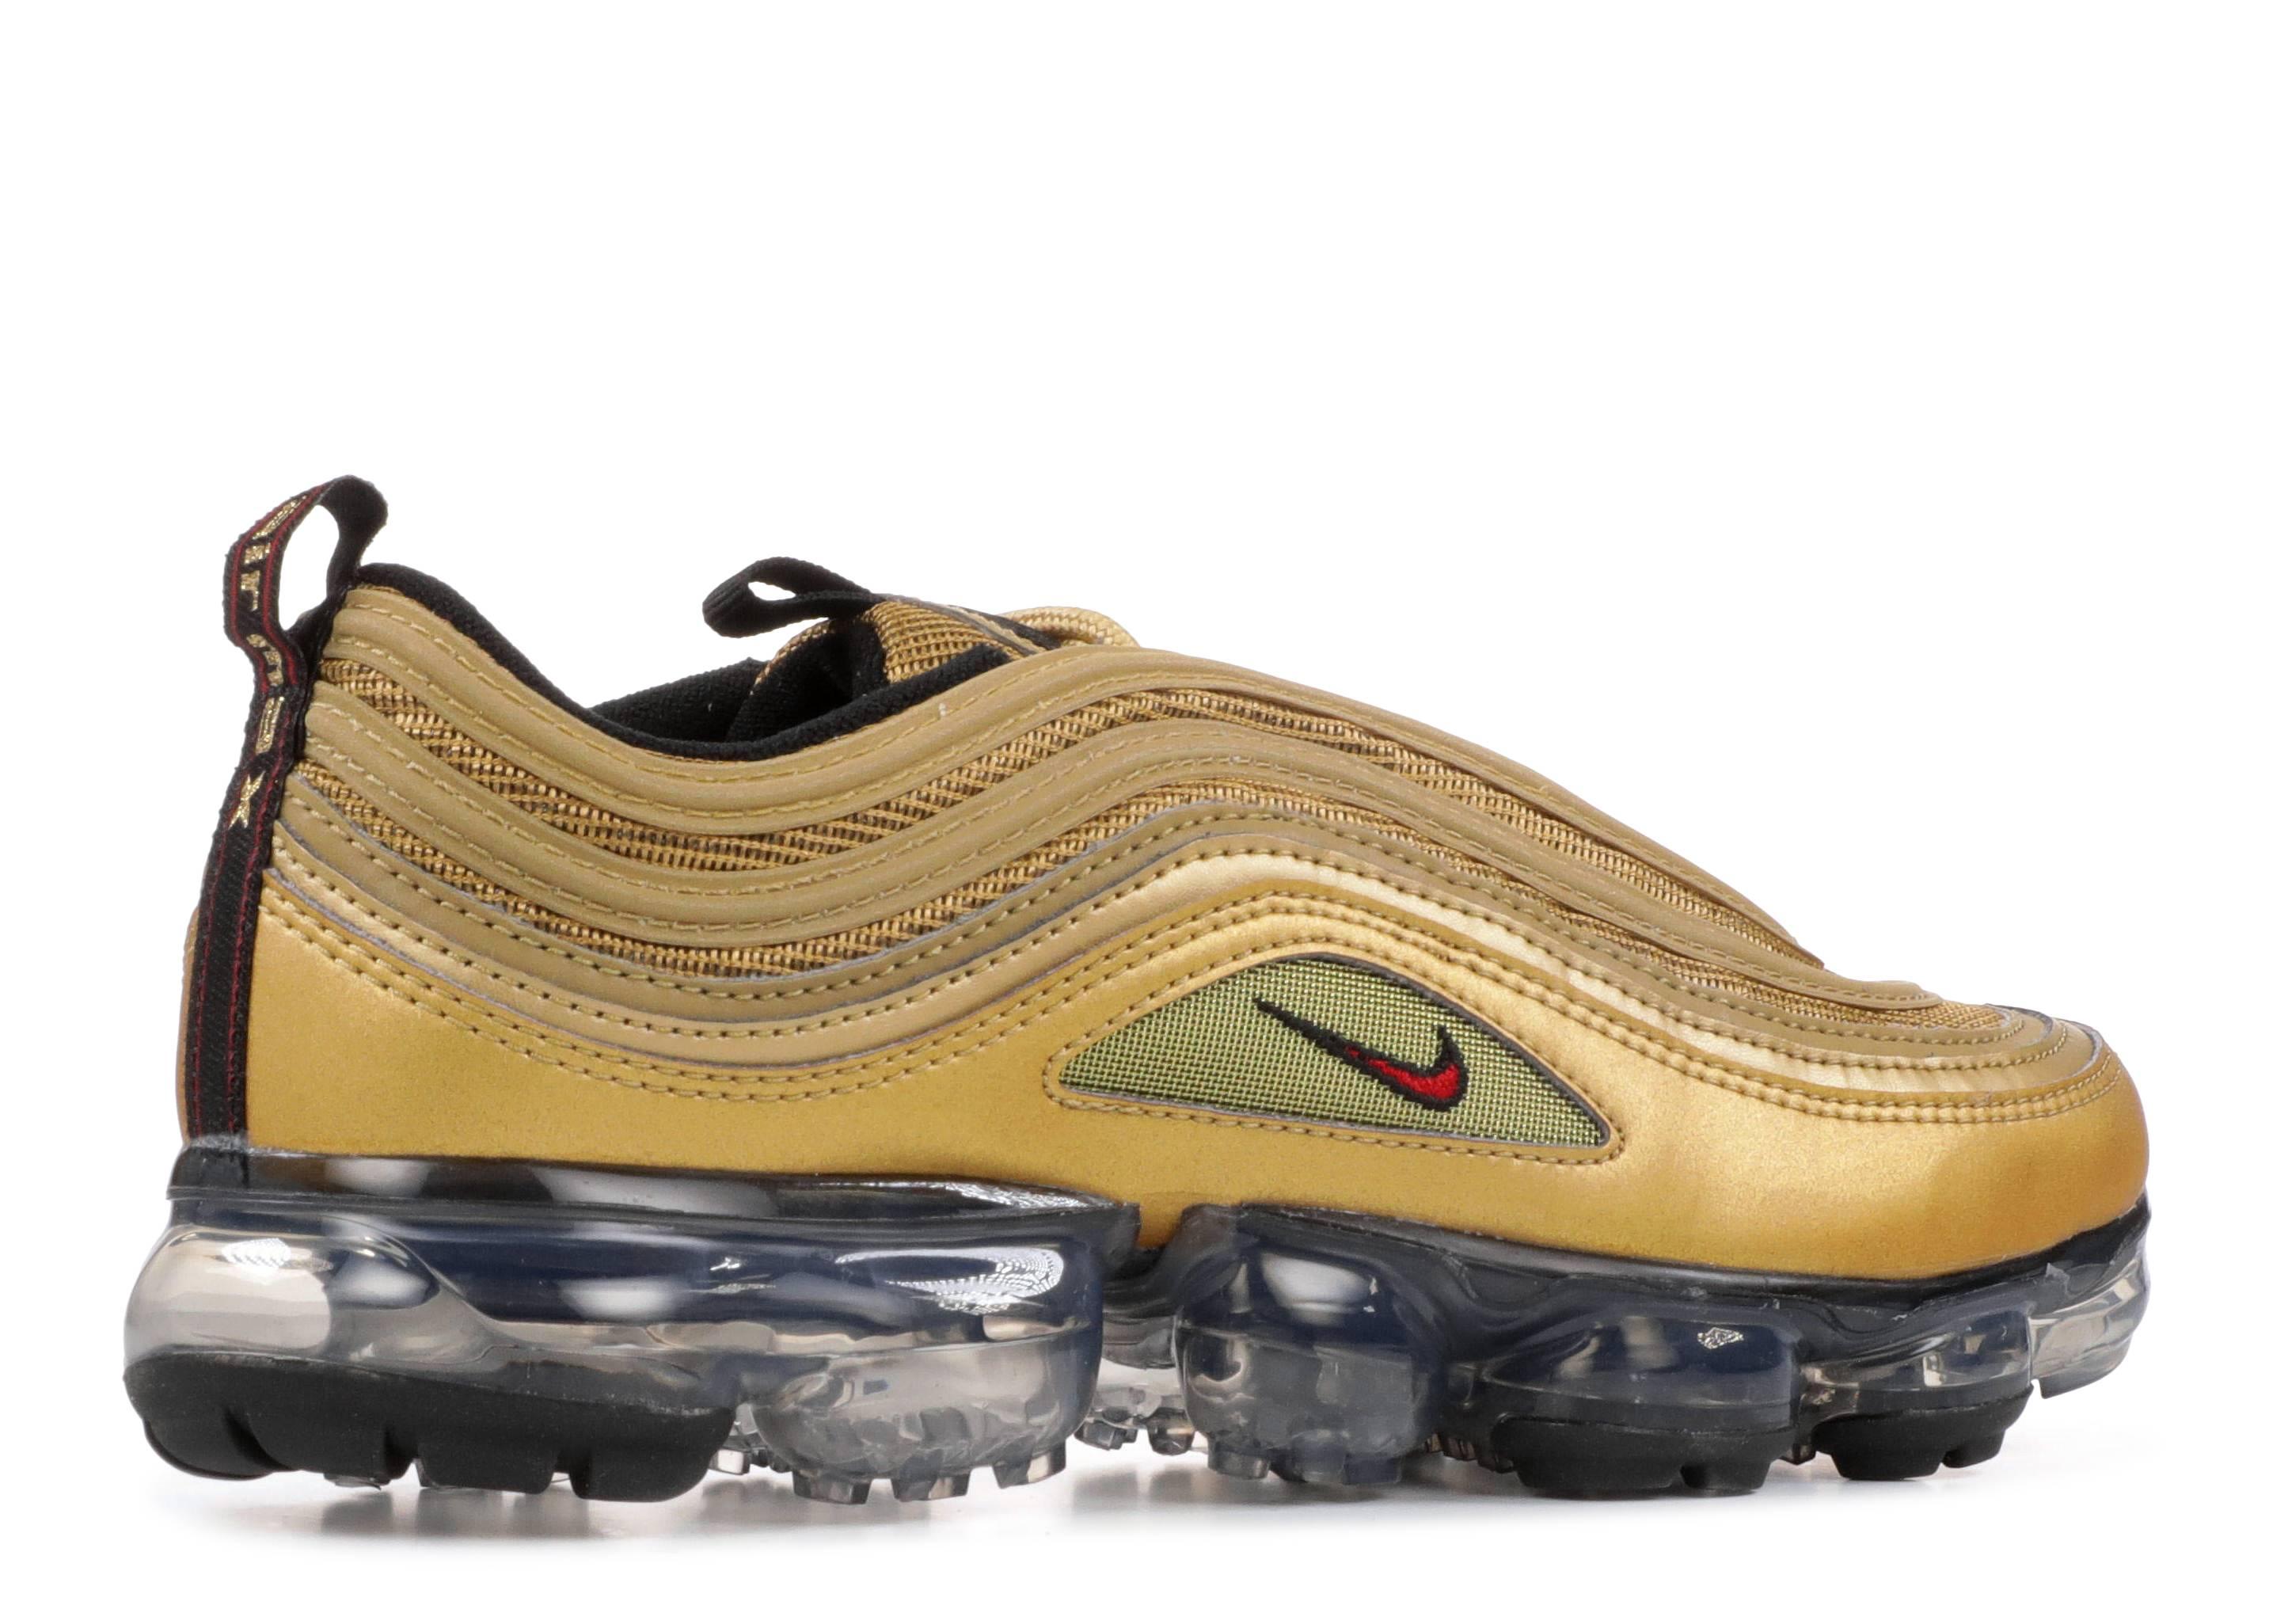 3c3ed27665a Nike Air Vapormax 97 (gs) - Nike - aq2657 700 - metallic gold black white varsity  red